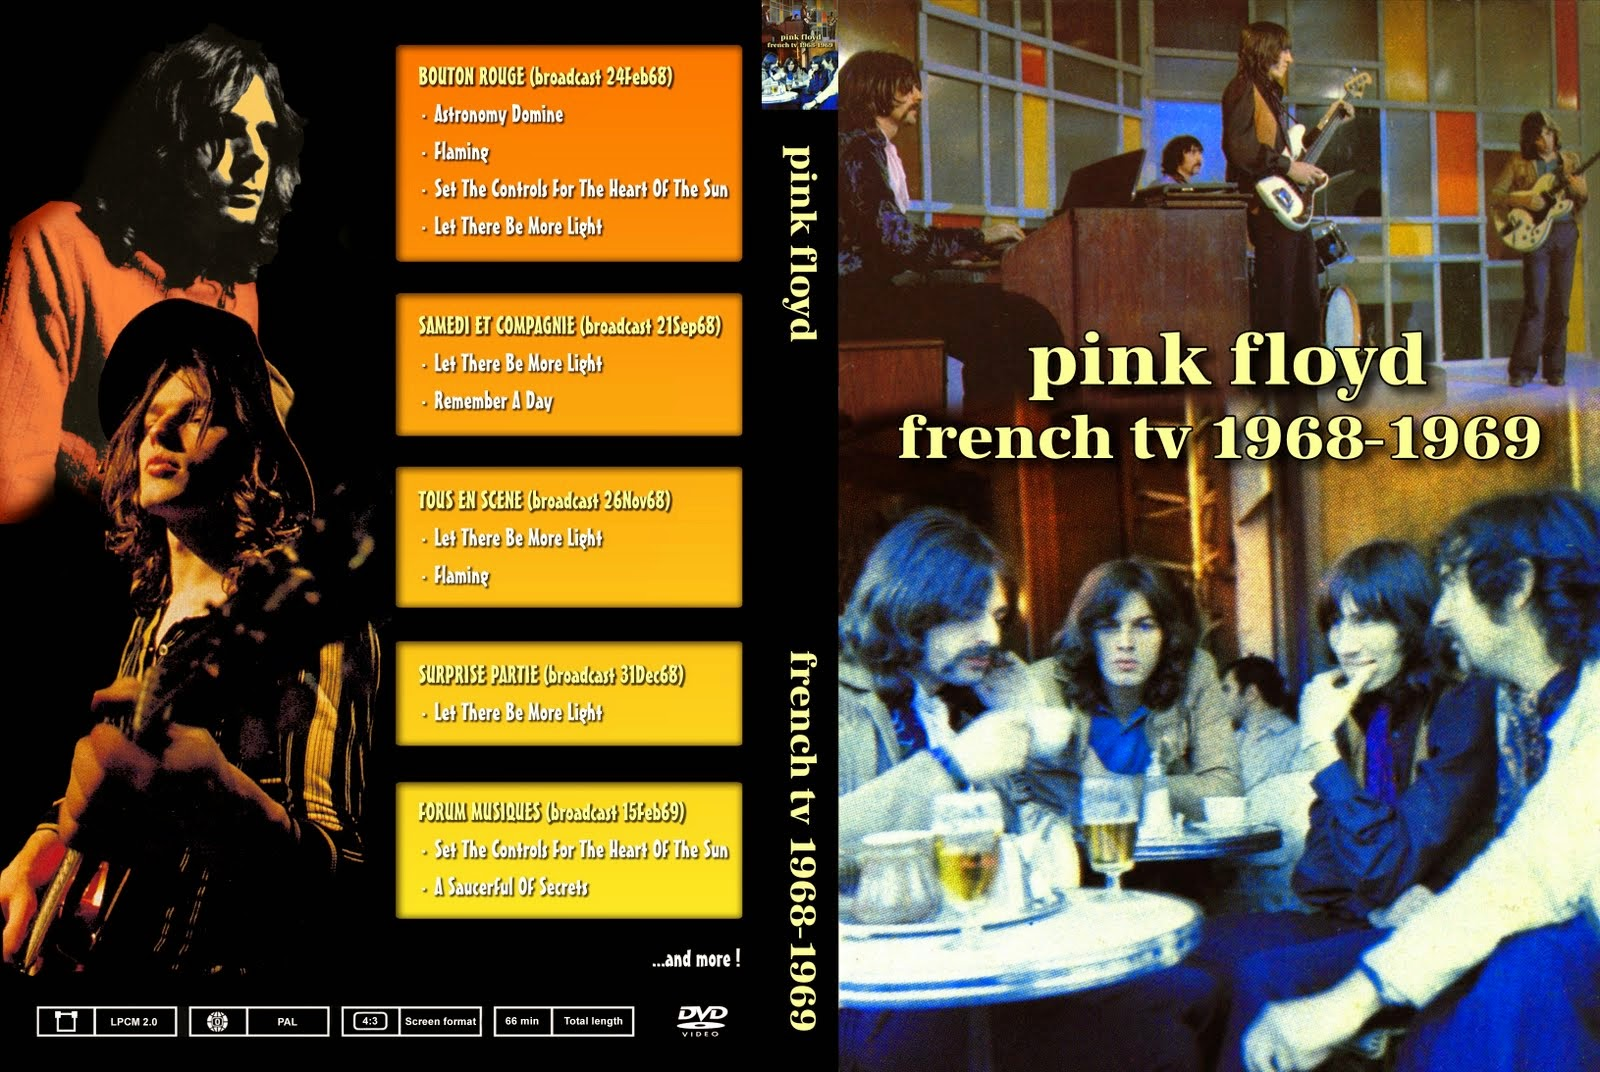 http://sydbarrettpinkfloydesp.blogspot.com.es/2013/03/video-y-audio-pink-floyd-en-francia.html